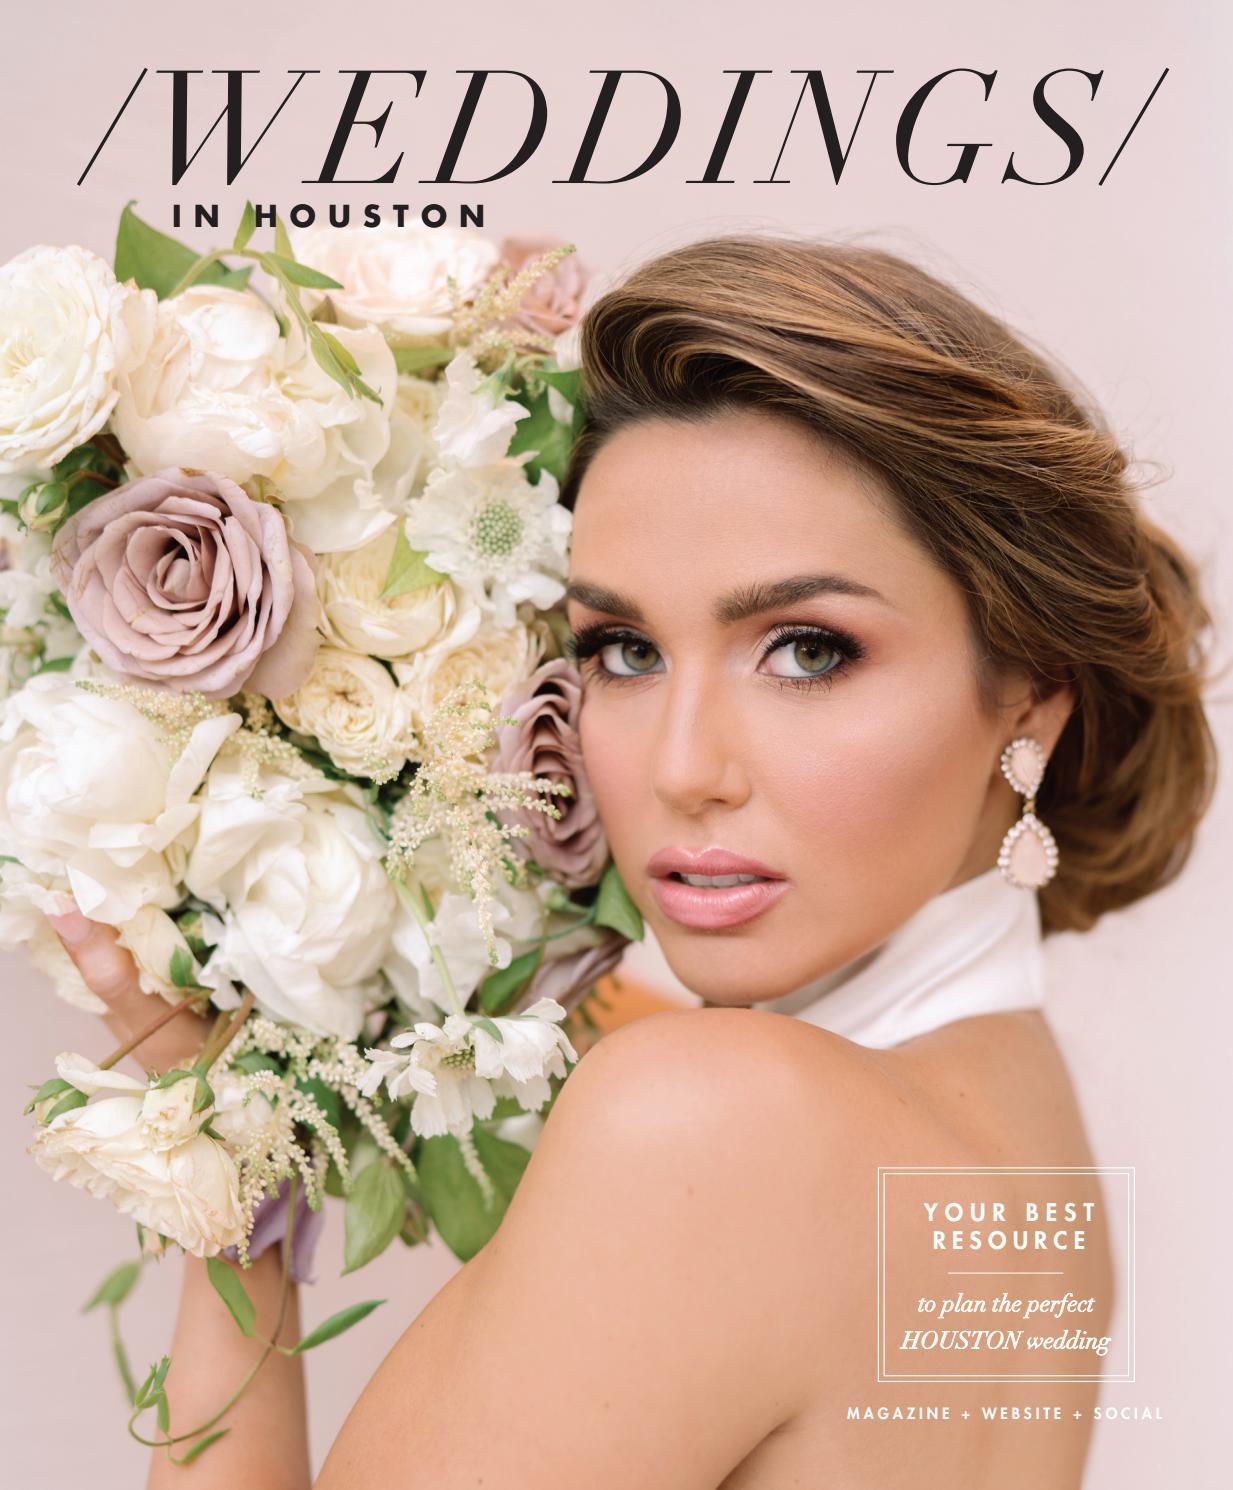 Weddings In Houston Magazine 2021